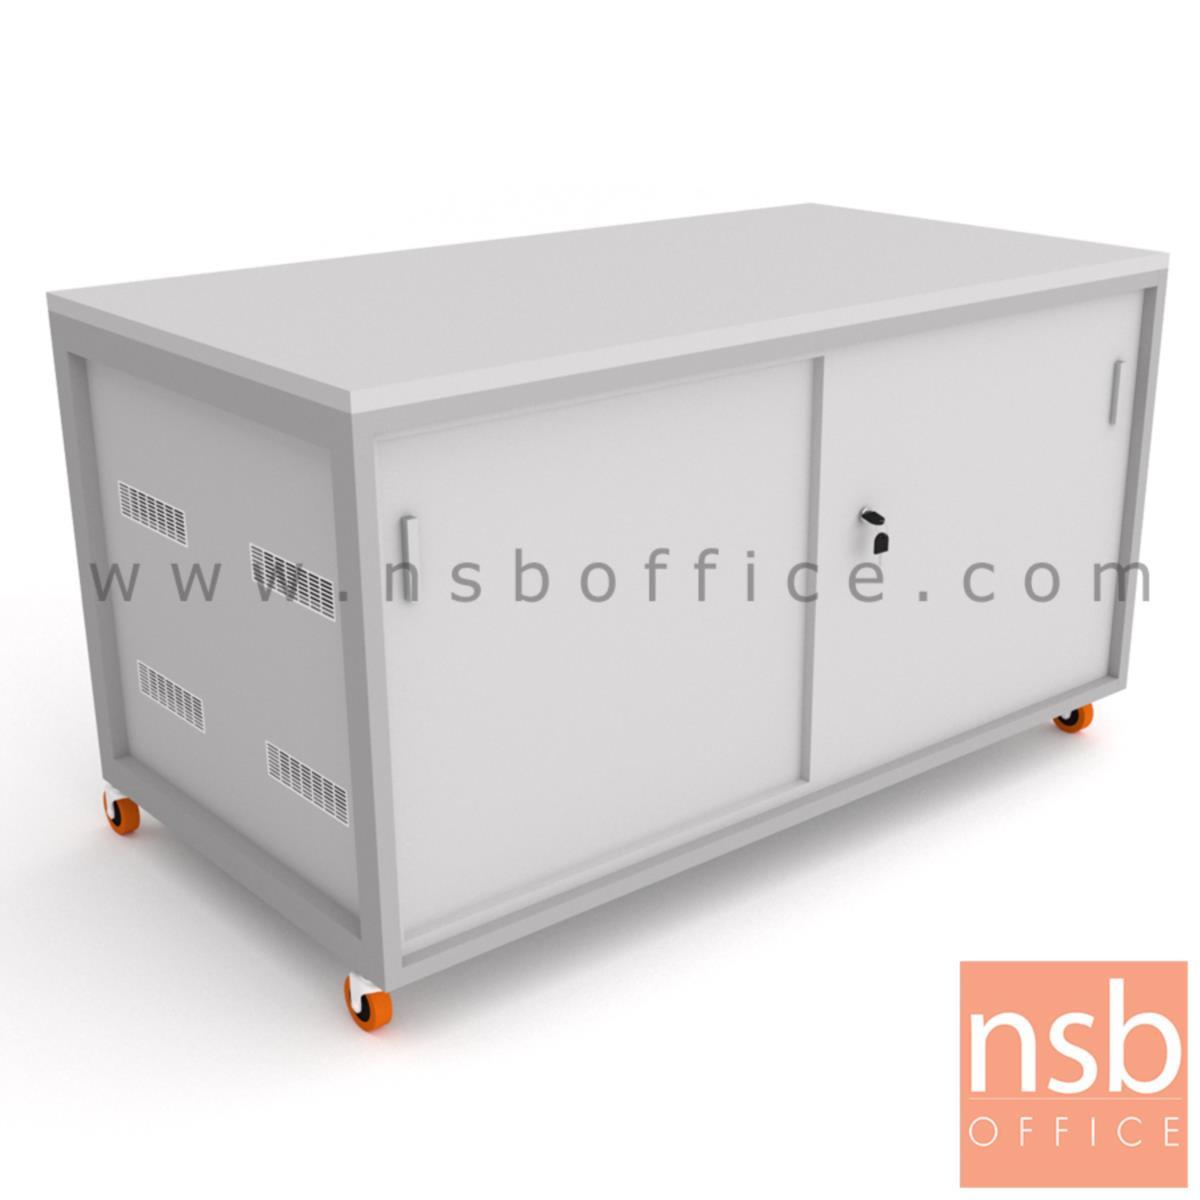 C12A017:ตู้แลปเก็บอุปกรณ์ บานเลื่อน รุ่น Scenery (ซีนเนอรี่) top HPL ขนาด 150W*80D cm. ล้อเลื่อน